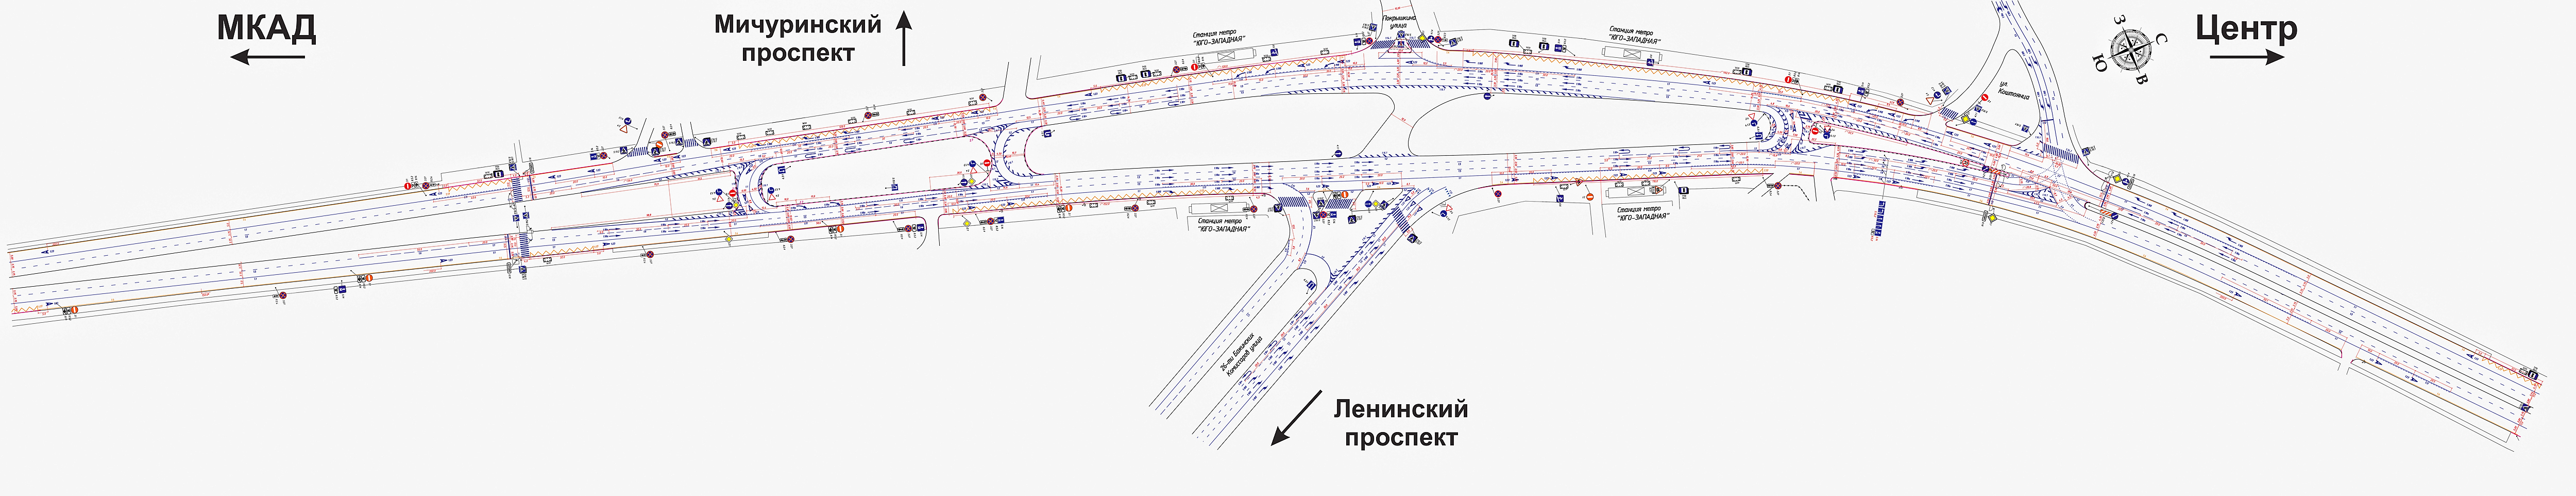 схема развязки мичуринский проспект-мкад